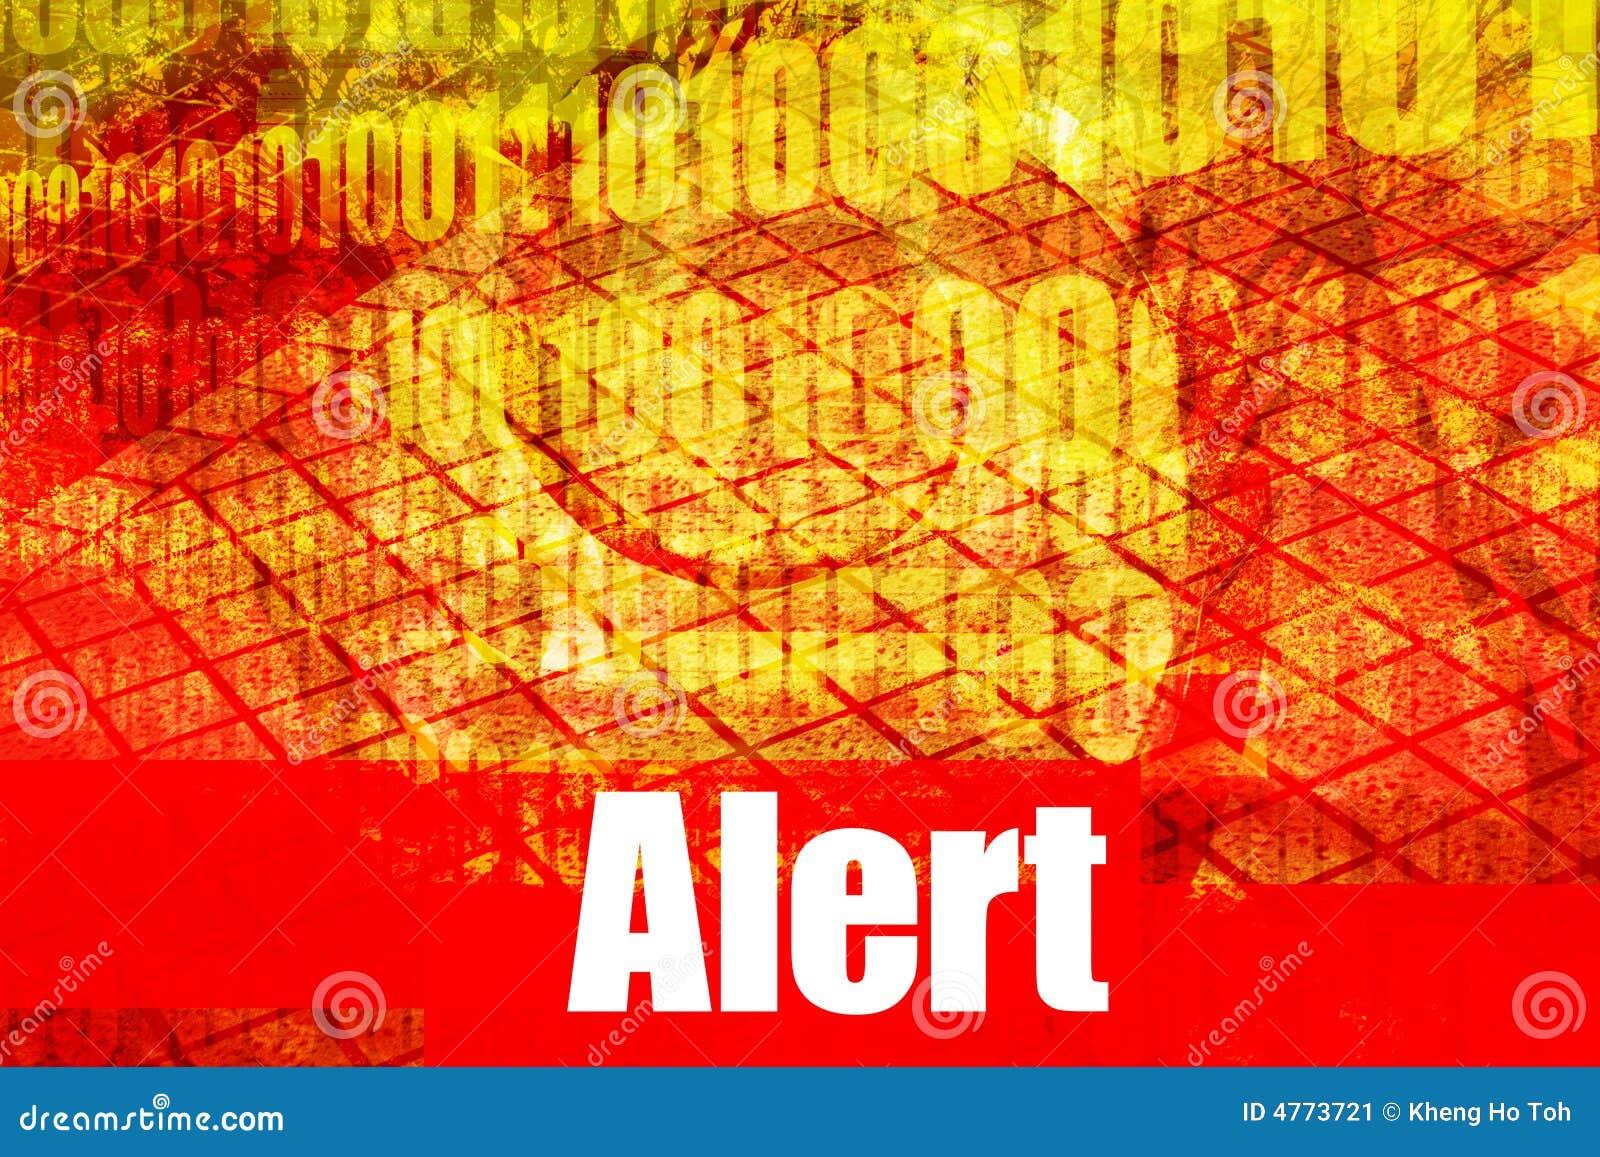 alert warning system message stock image   image 4773721